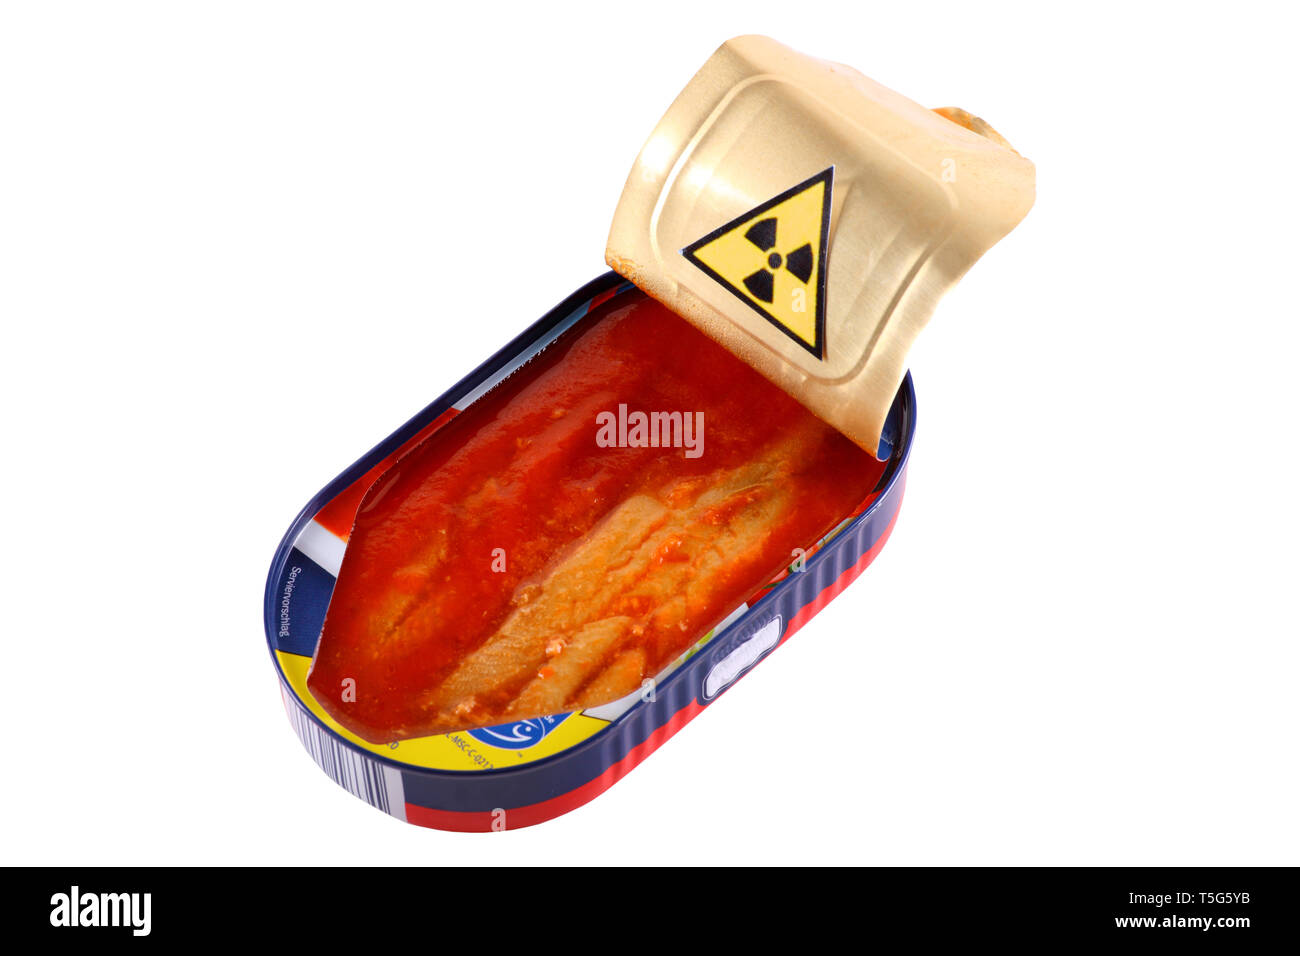 Radioactively contaminated fish - isolated on a white background. - Stock Image